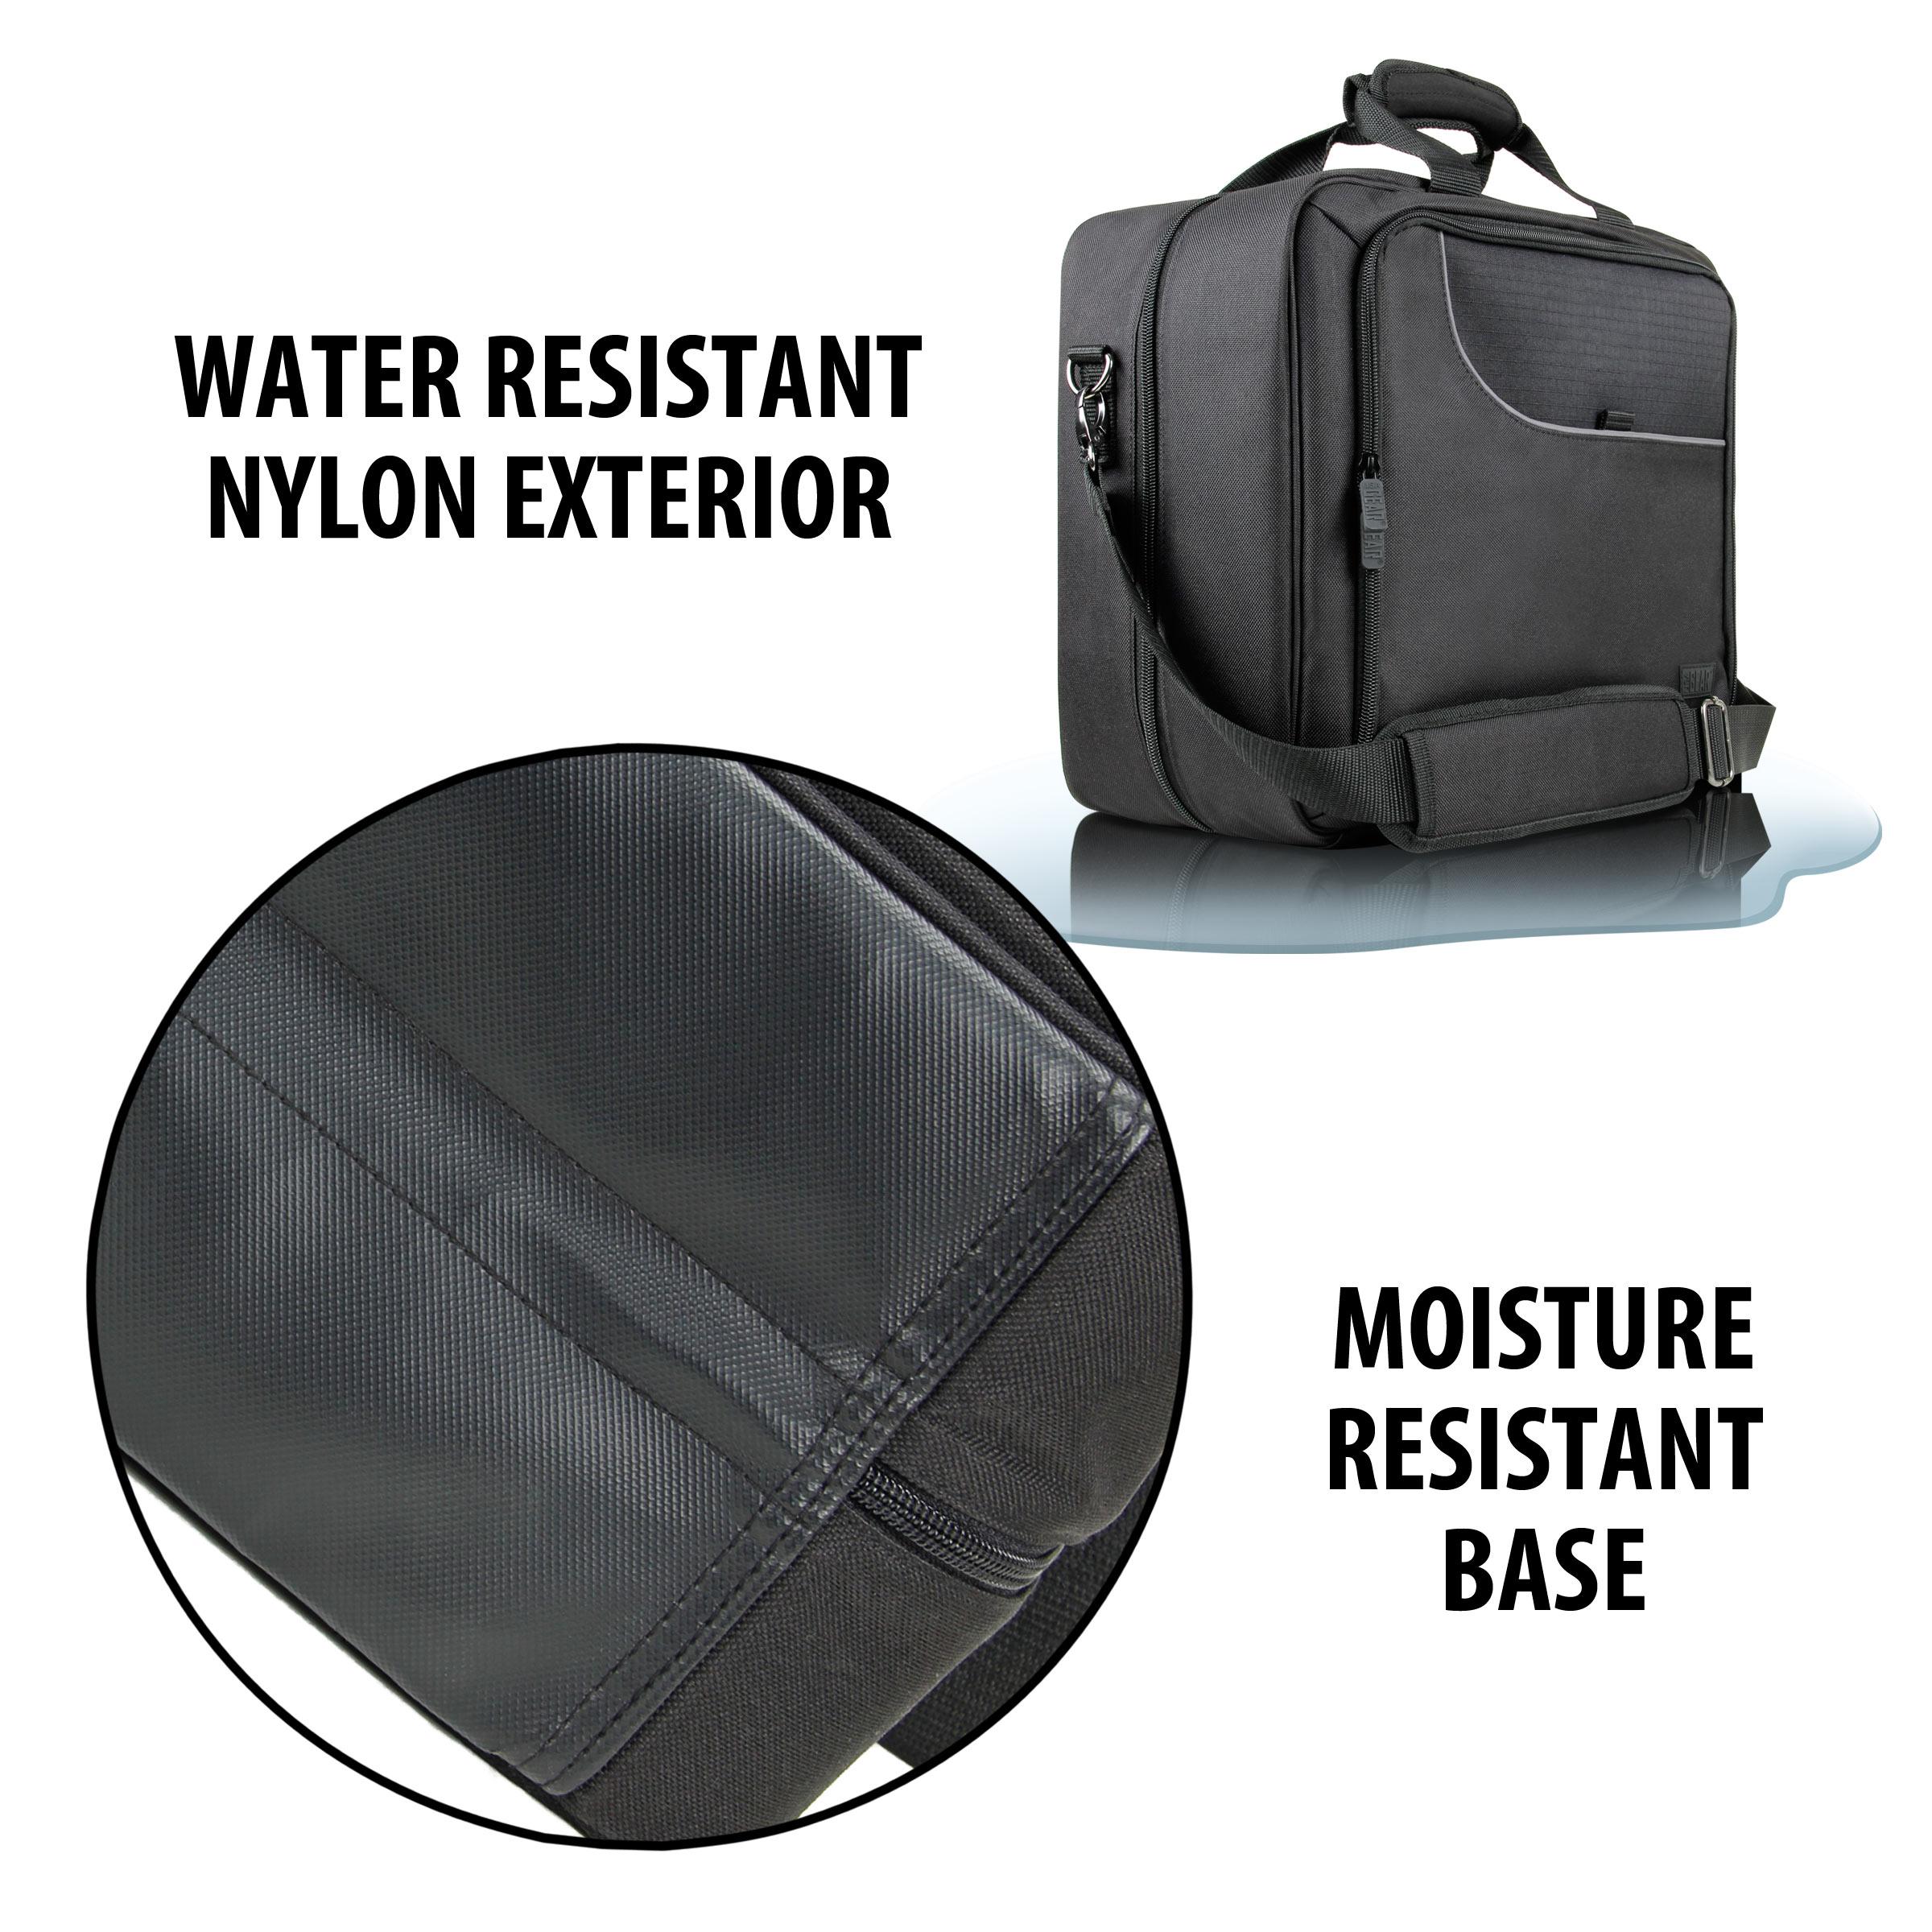 USA Gear Meccano M.A.X Storage Carrying Case - Shoulder Strap & Customizable Interior 6